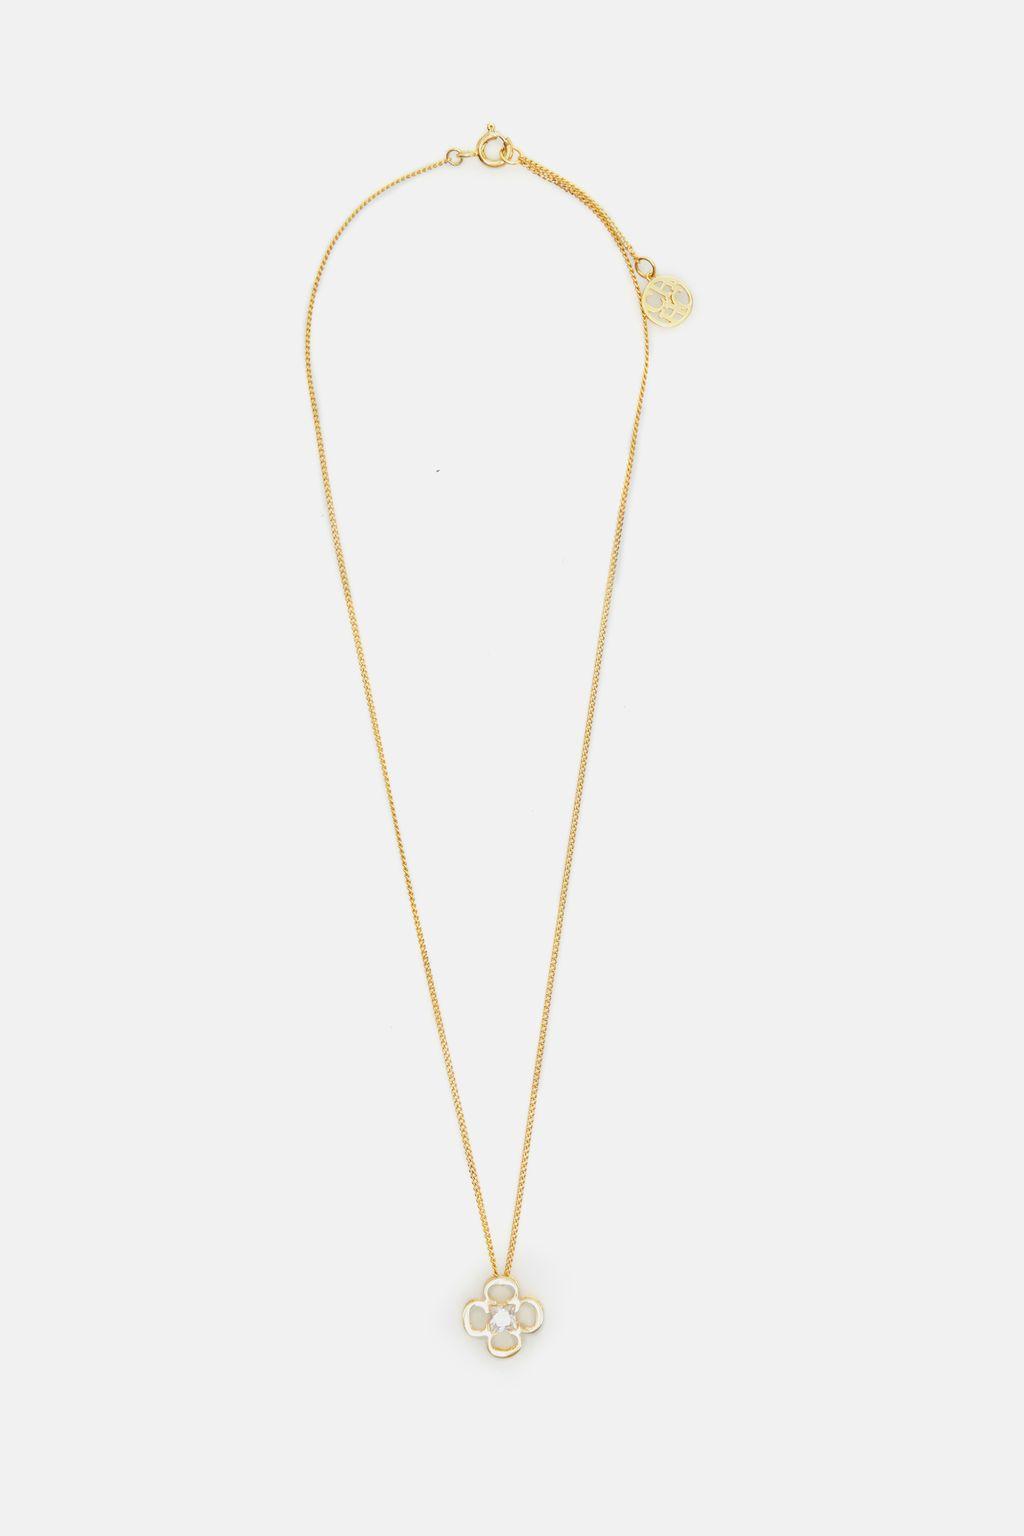 Insignia Rosetta necklace